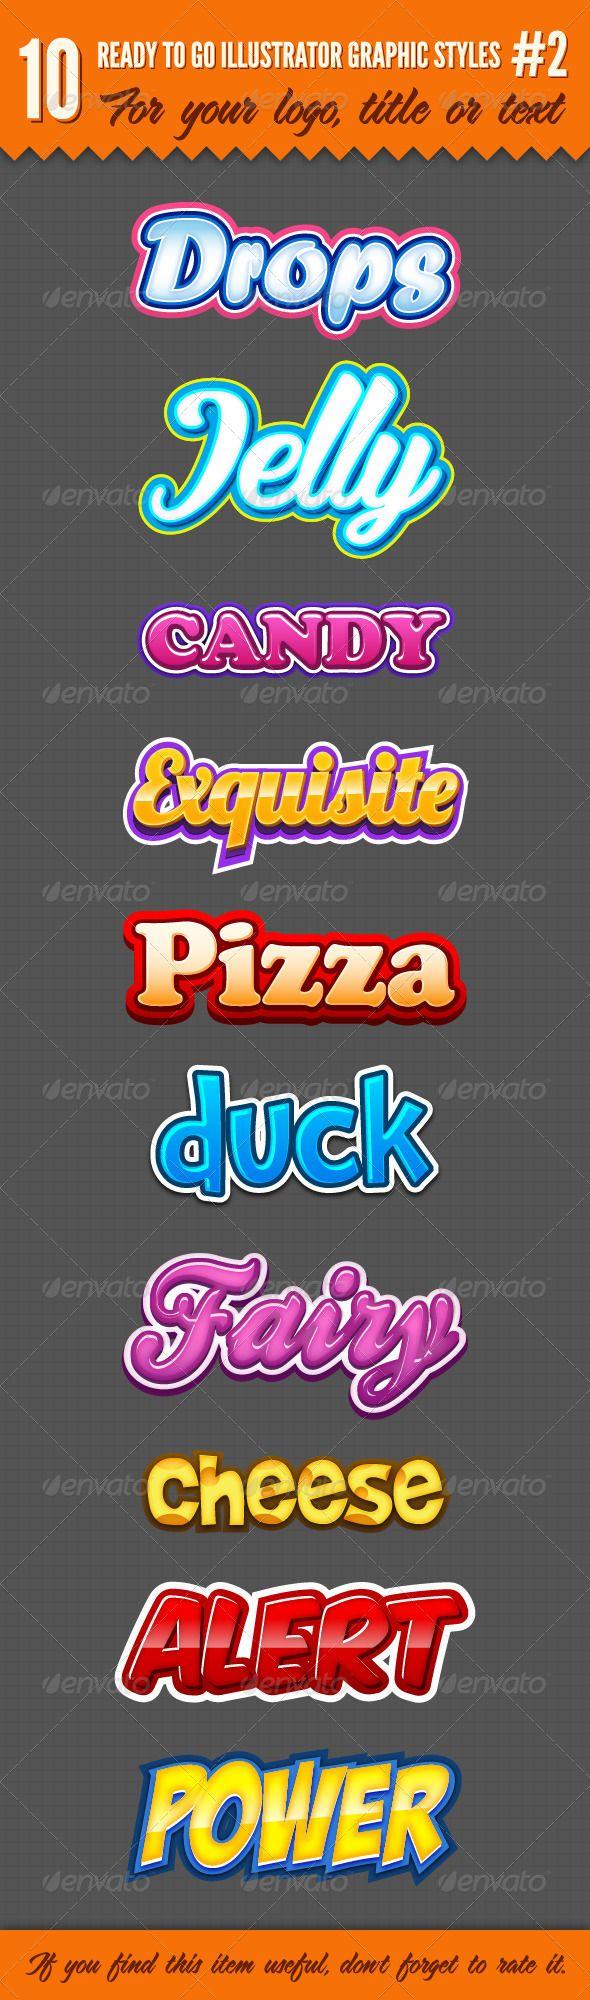 10 Logo Graphic Styles #2 - Styles Illustrator